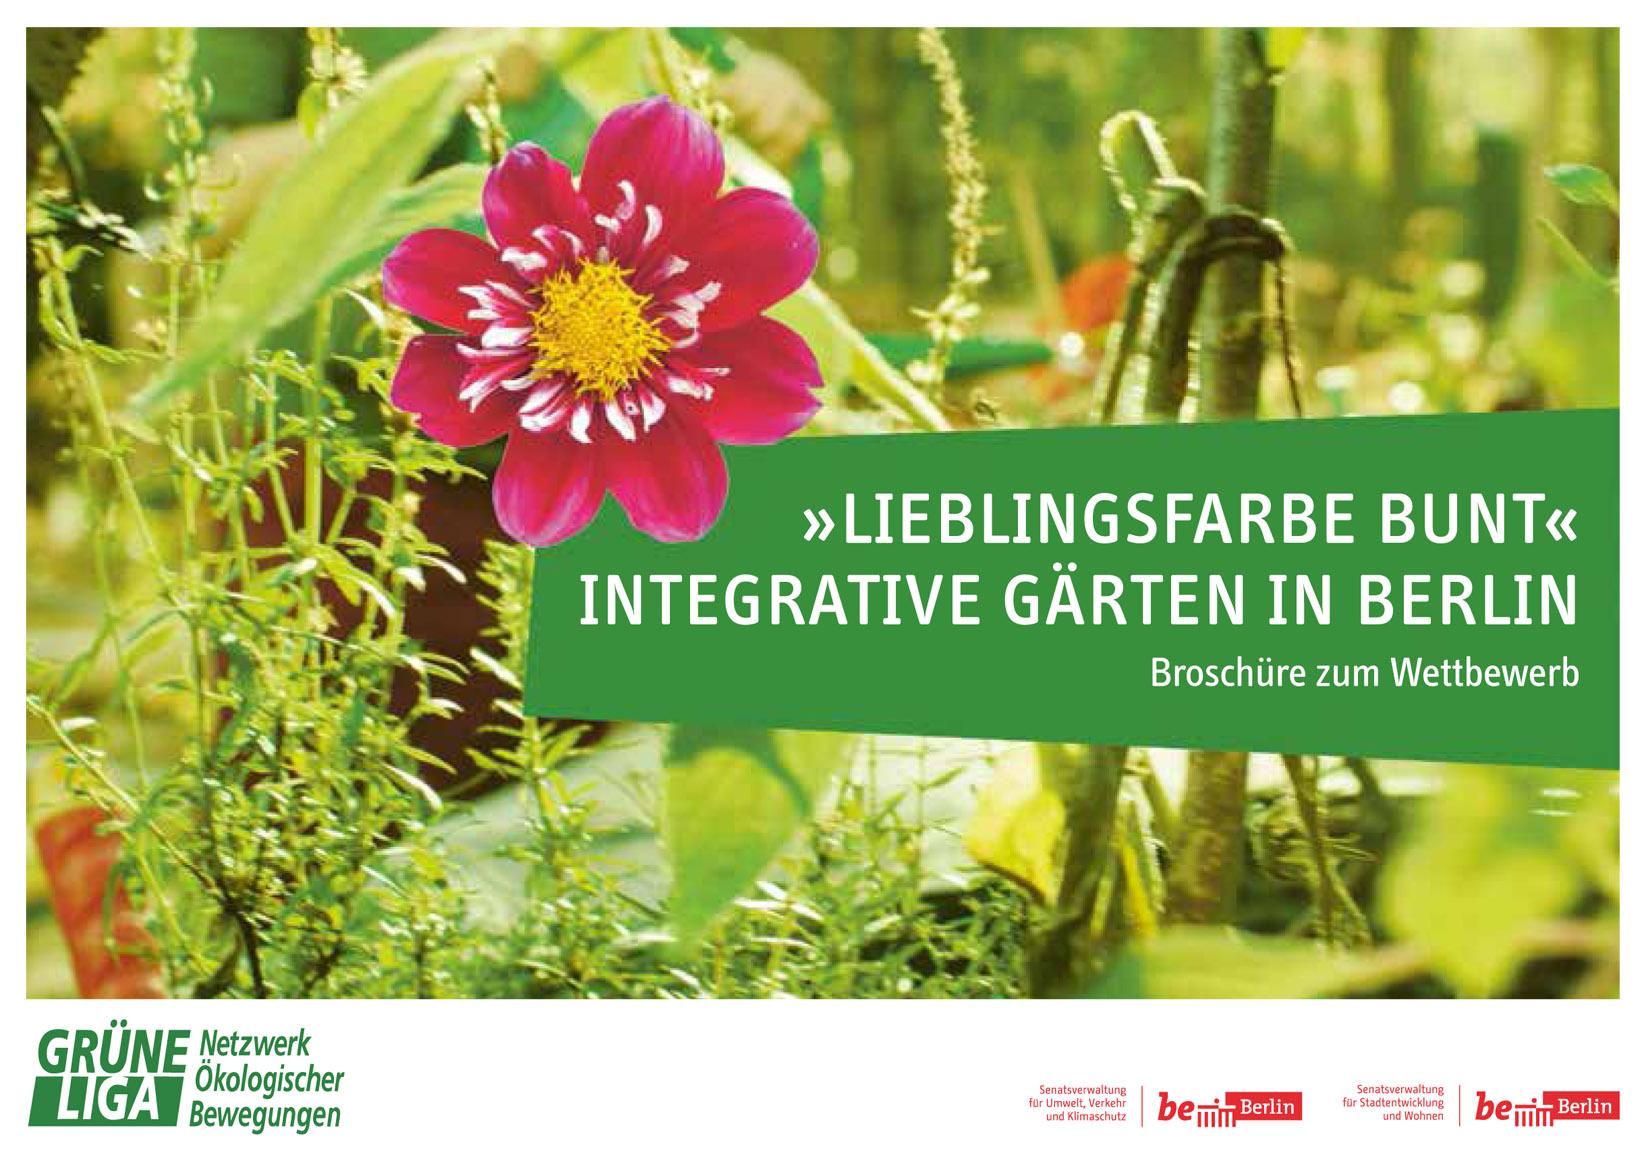 Zusammen wachsen gr ne liga berlin e v netzwerk for Pflanzencenter berlin